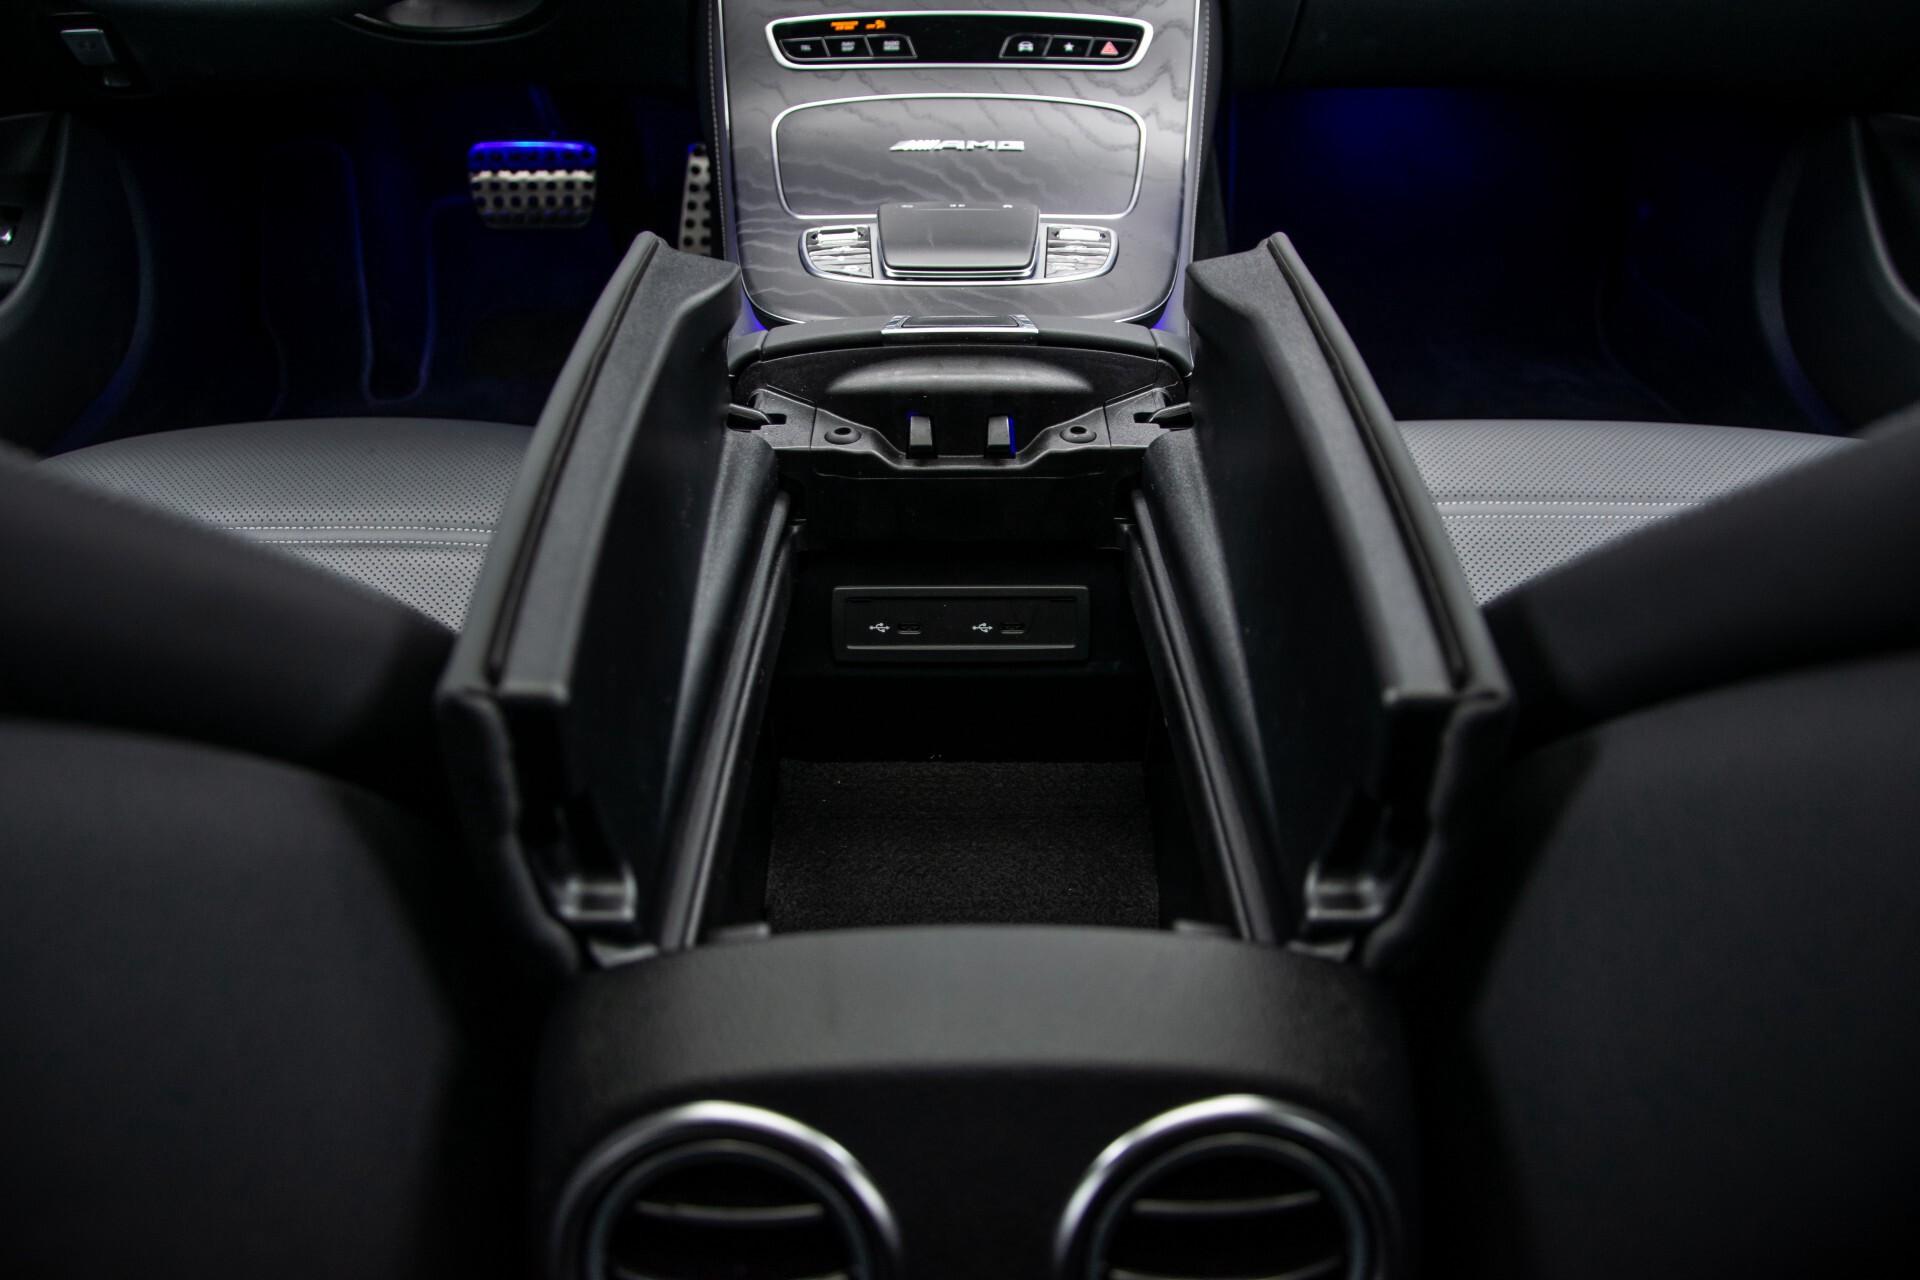 Mercedes-Benz E-Klasse 63 S AMG 4M+ NIEUW MODEL Night/Massage/Rij-assist/Keyless/Hud Aut9 Foto 20